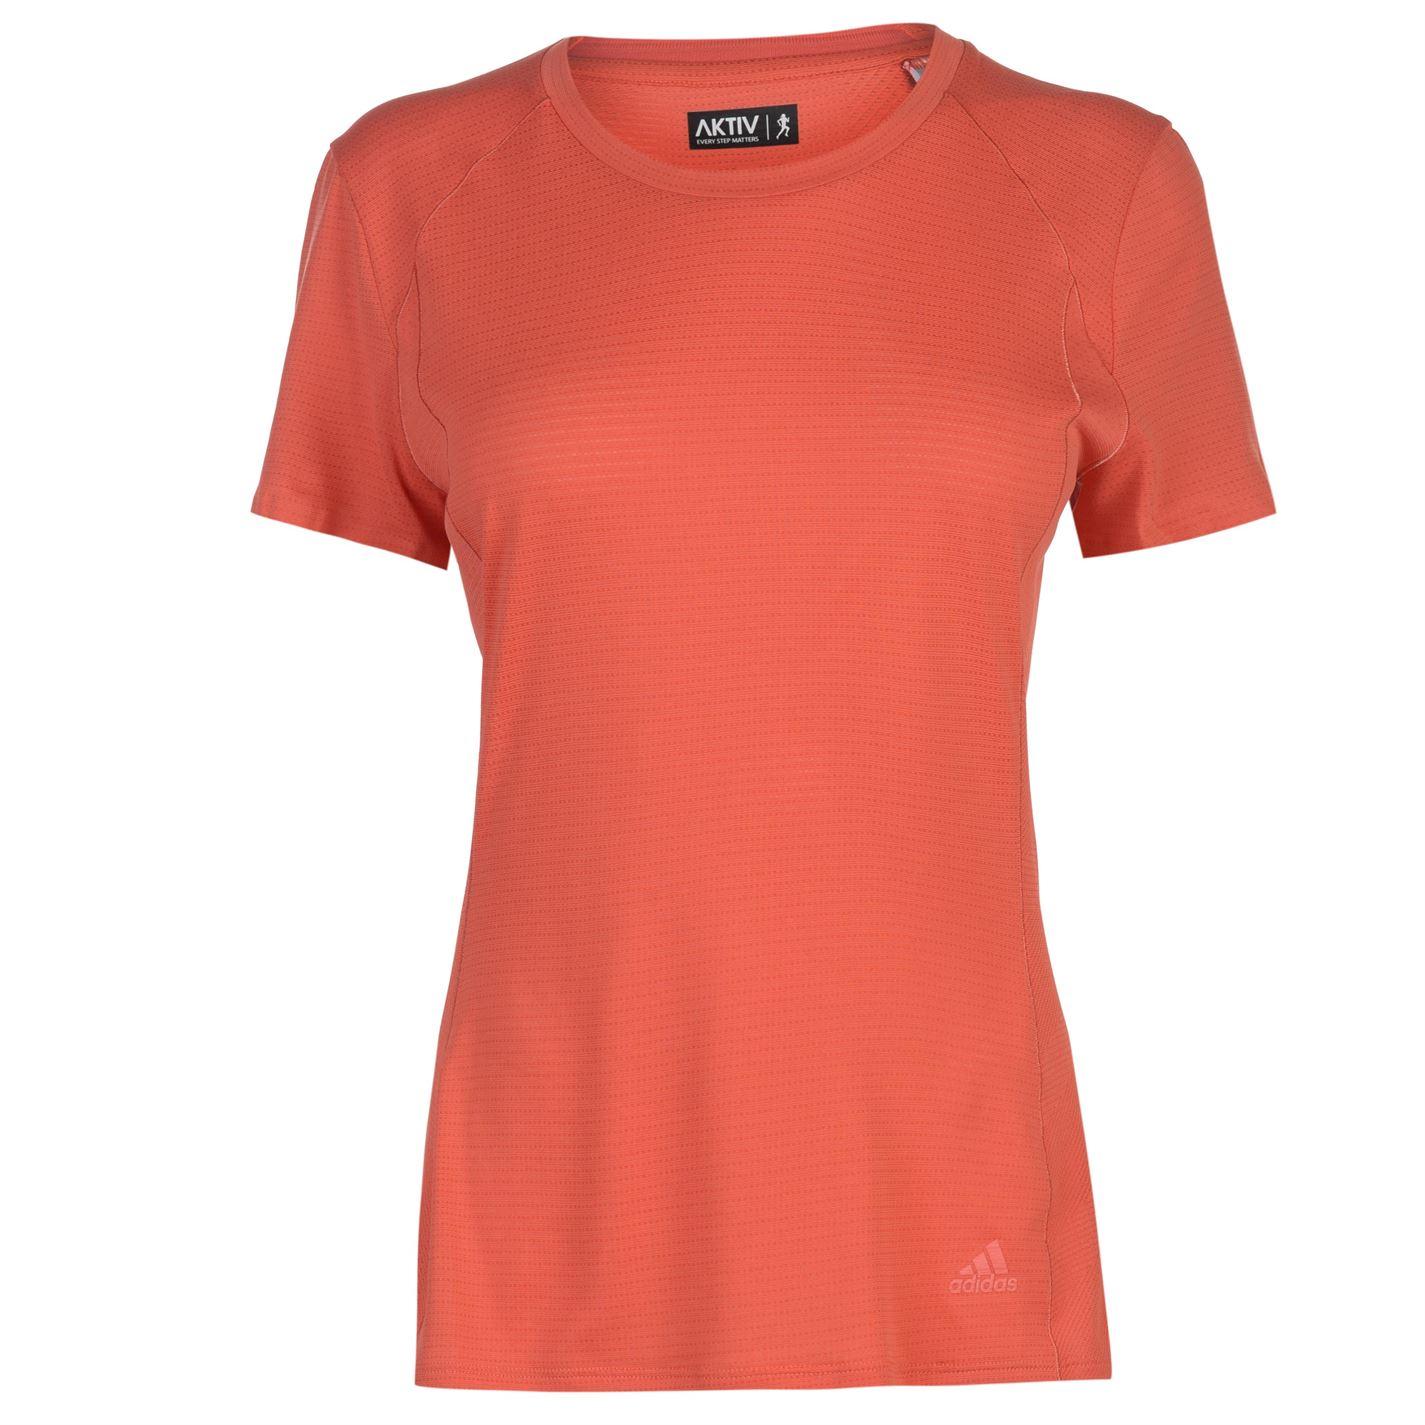 Adidas FR Supernova Short Sleeve T Shirt Ladies